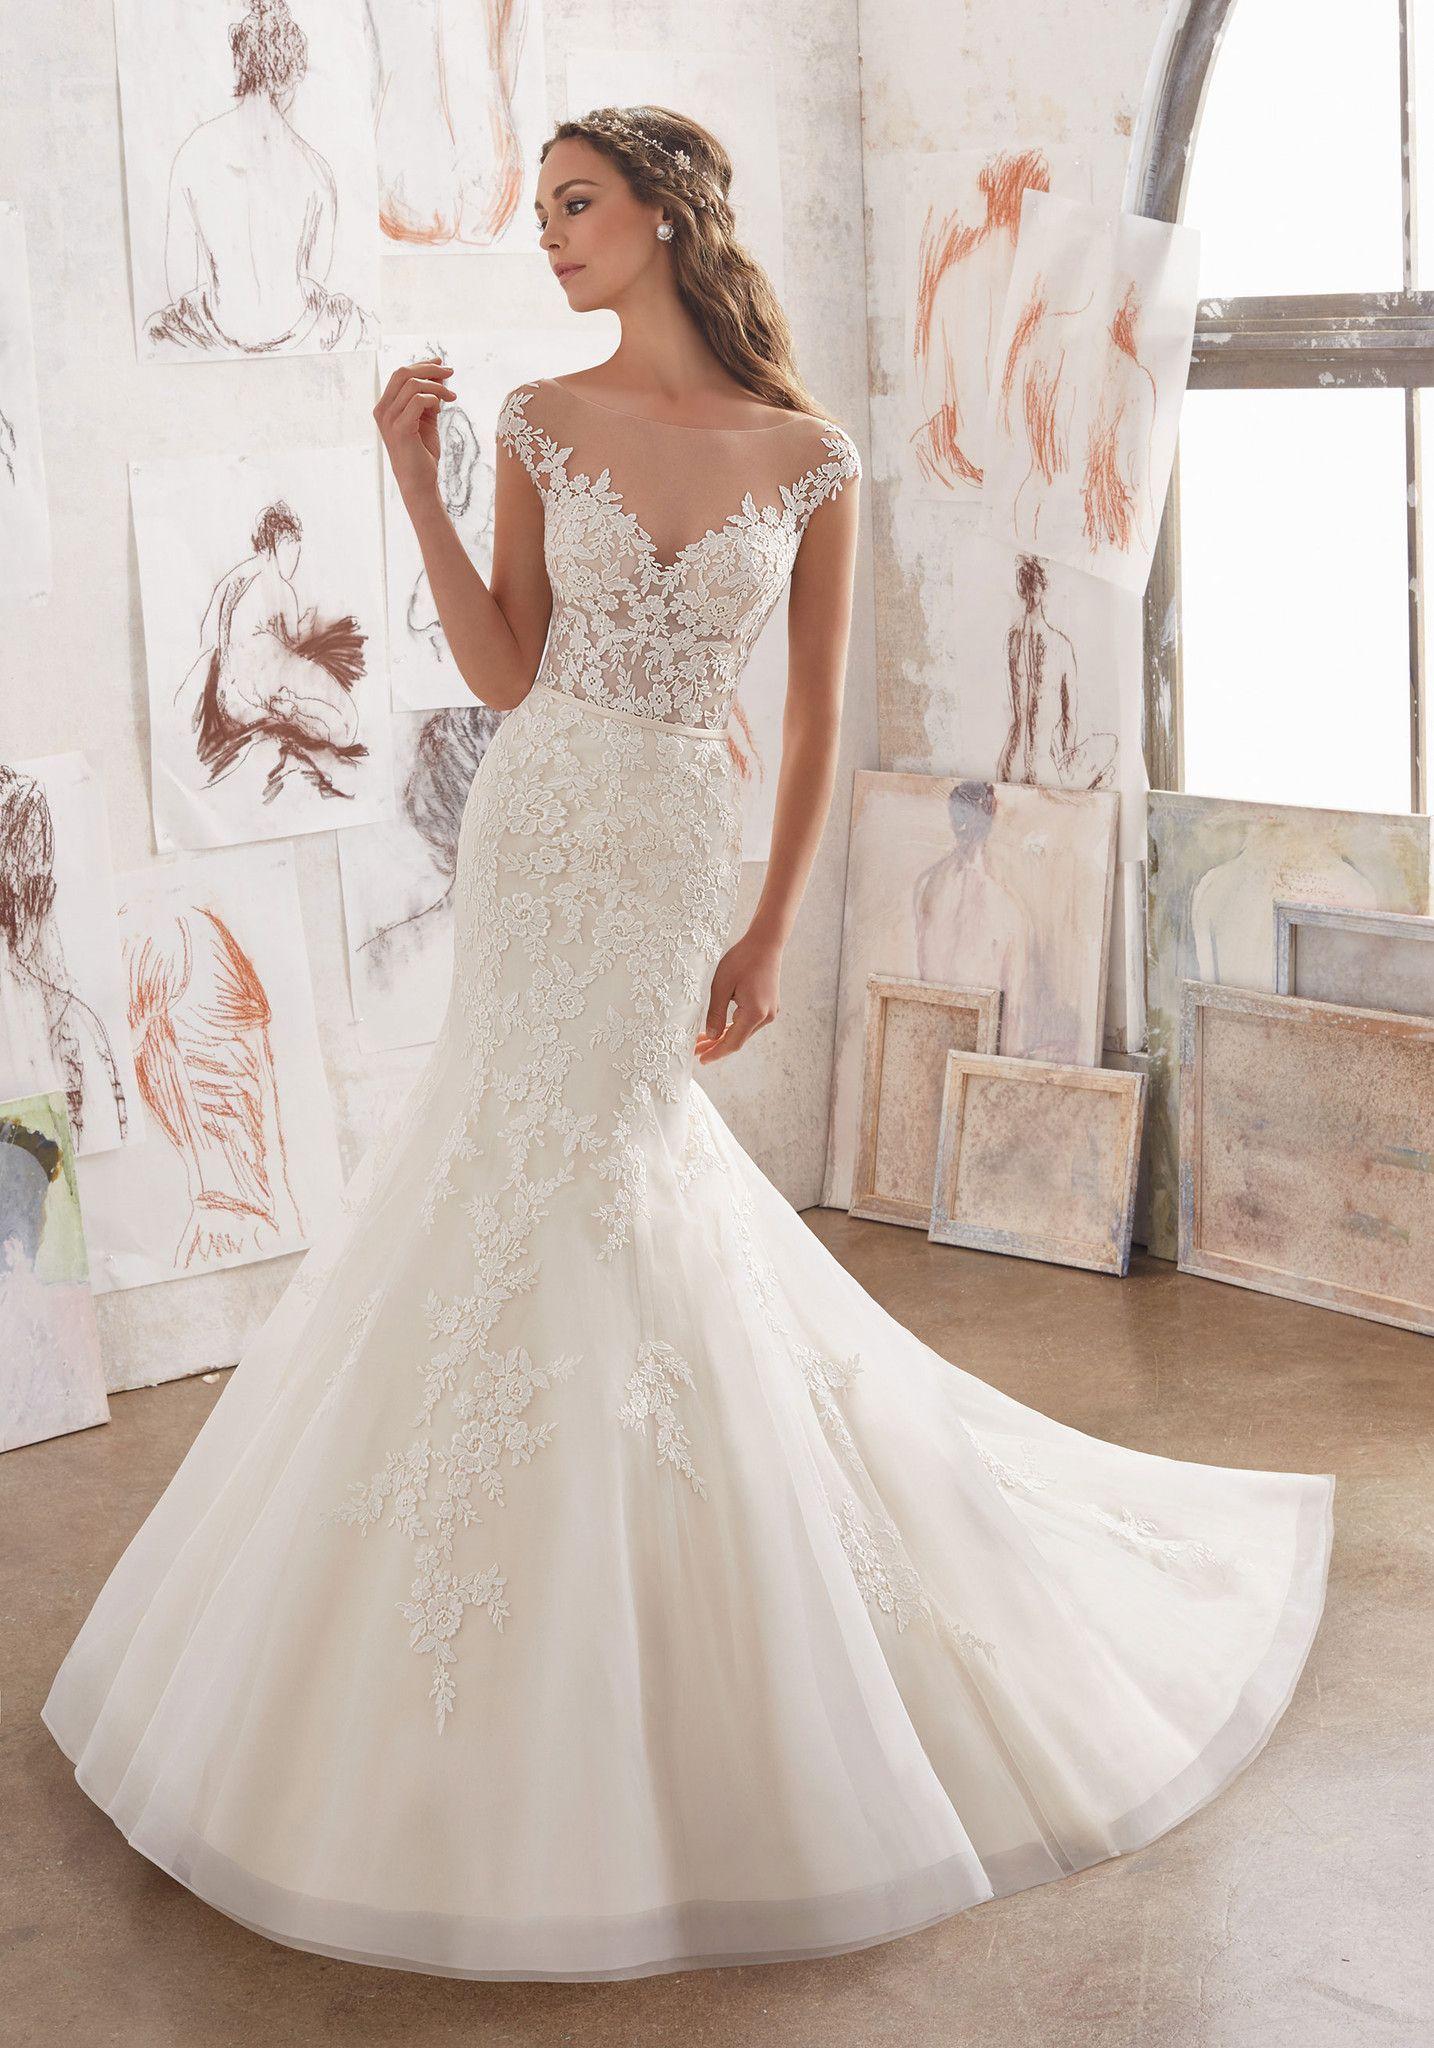 Blu - Martha - 5509 - All Dressed Up, Bridal Gown | Bridal gowns ...